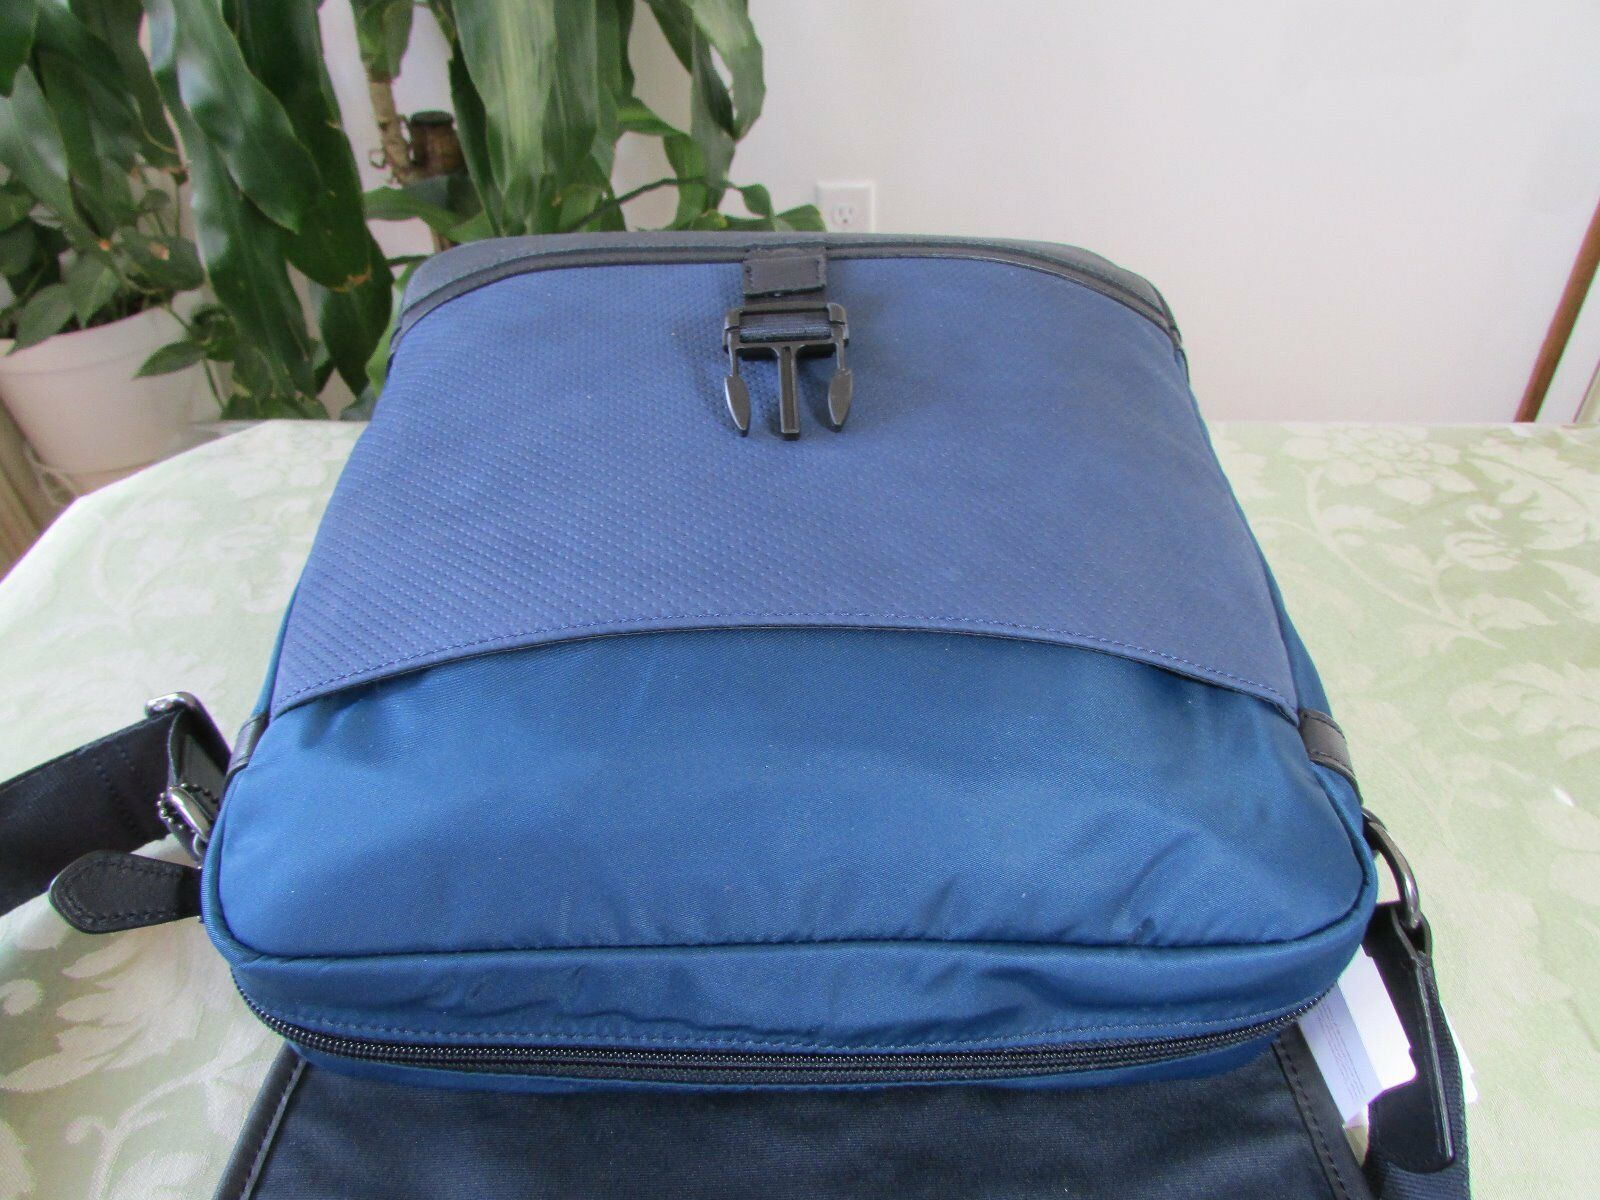 Coach Varick Perforated Leather Map Messenger Bag F71552 Indigo   eBay